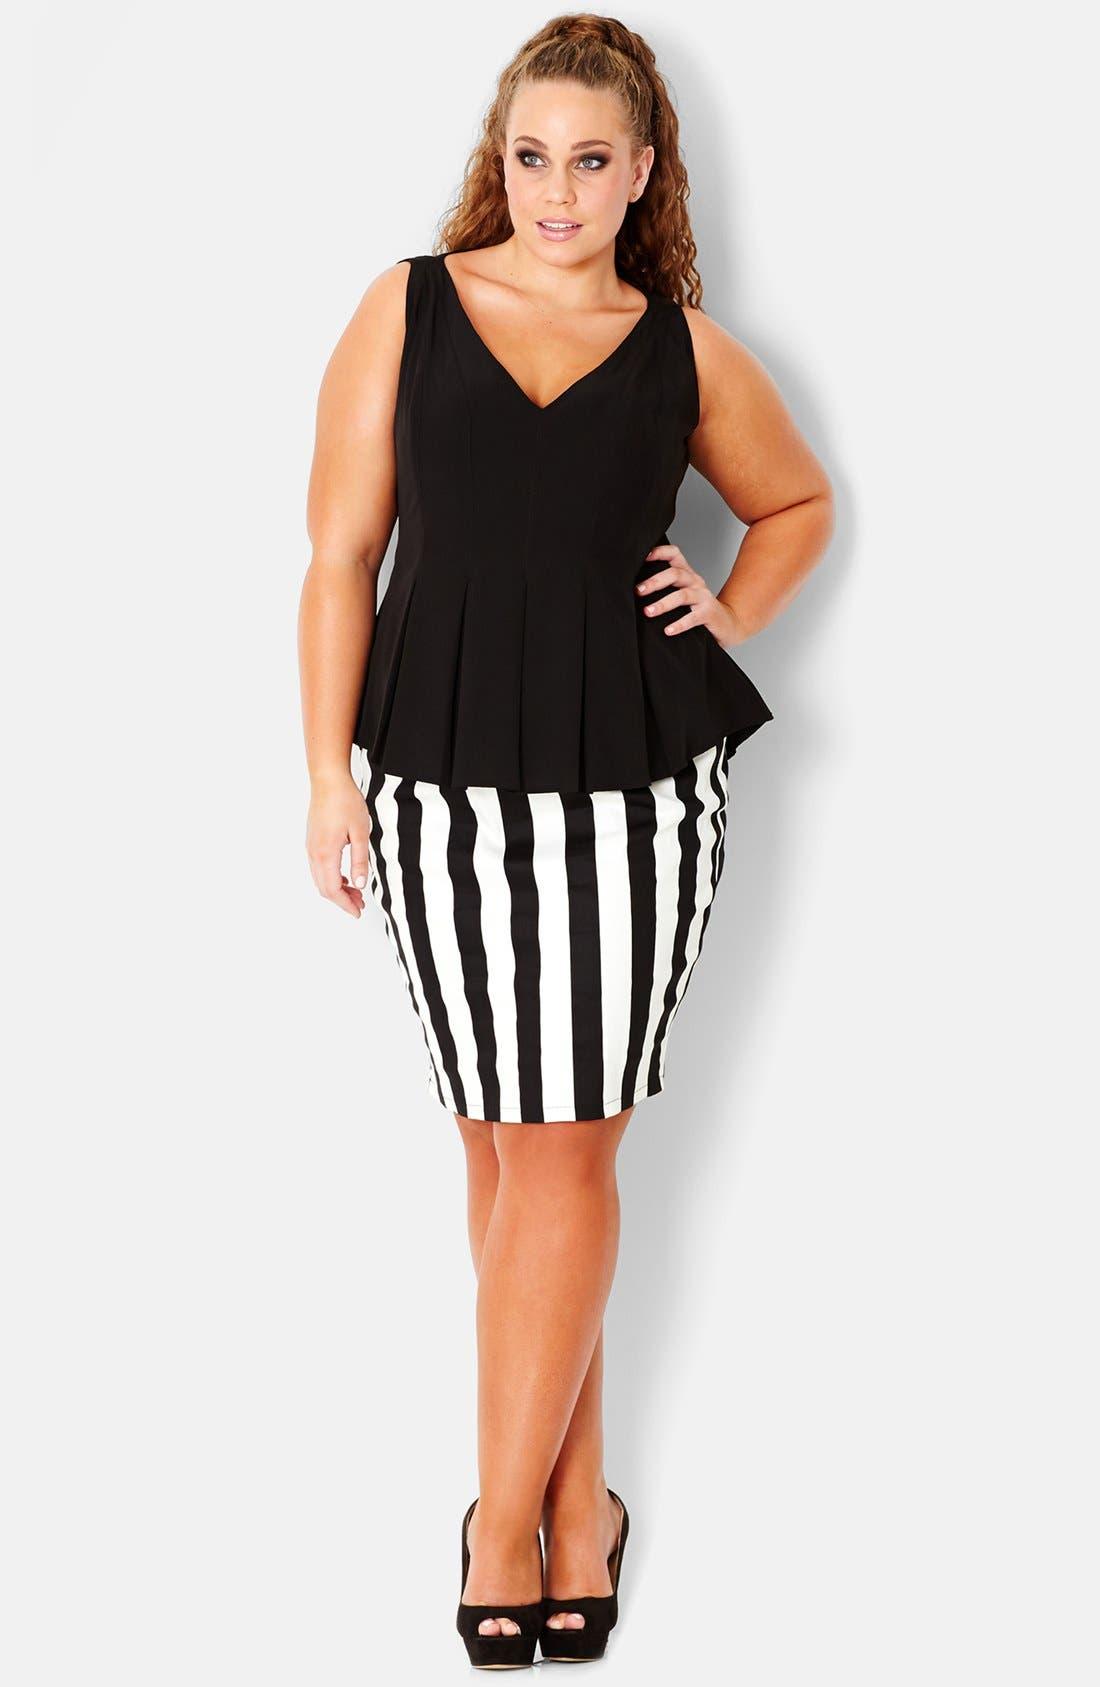 Alternate Image 1 Selected - City Chic Vertical Stripe Tube Skirt (Plus Size)